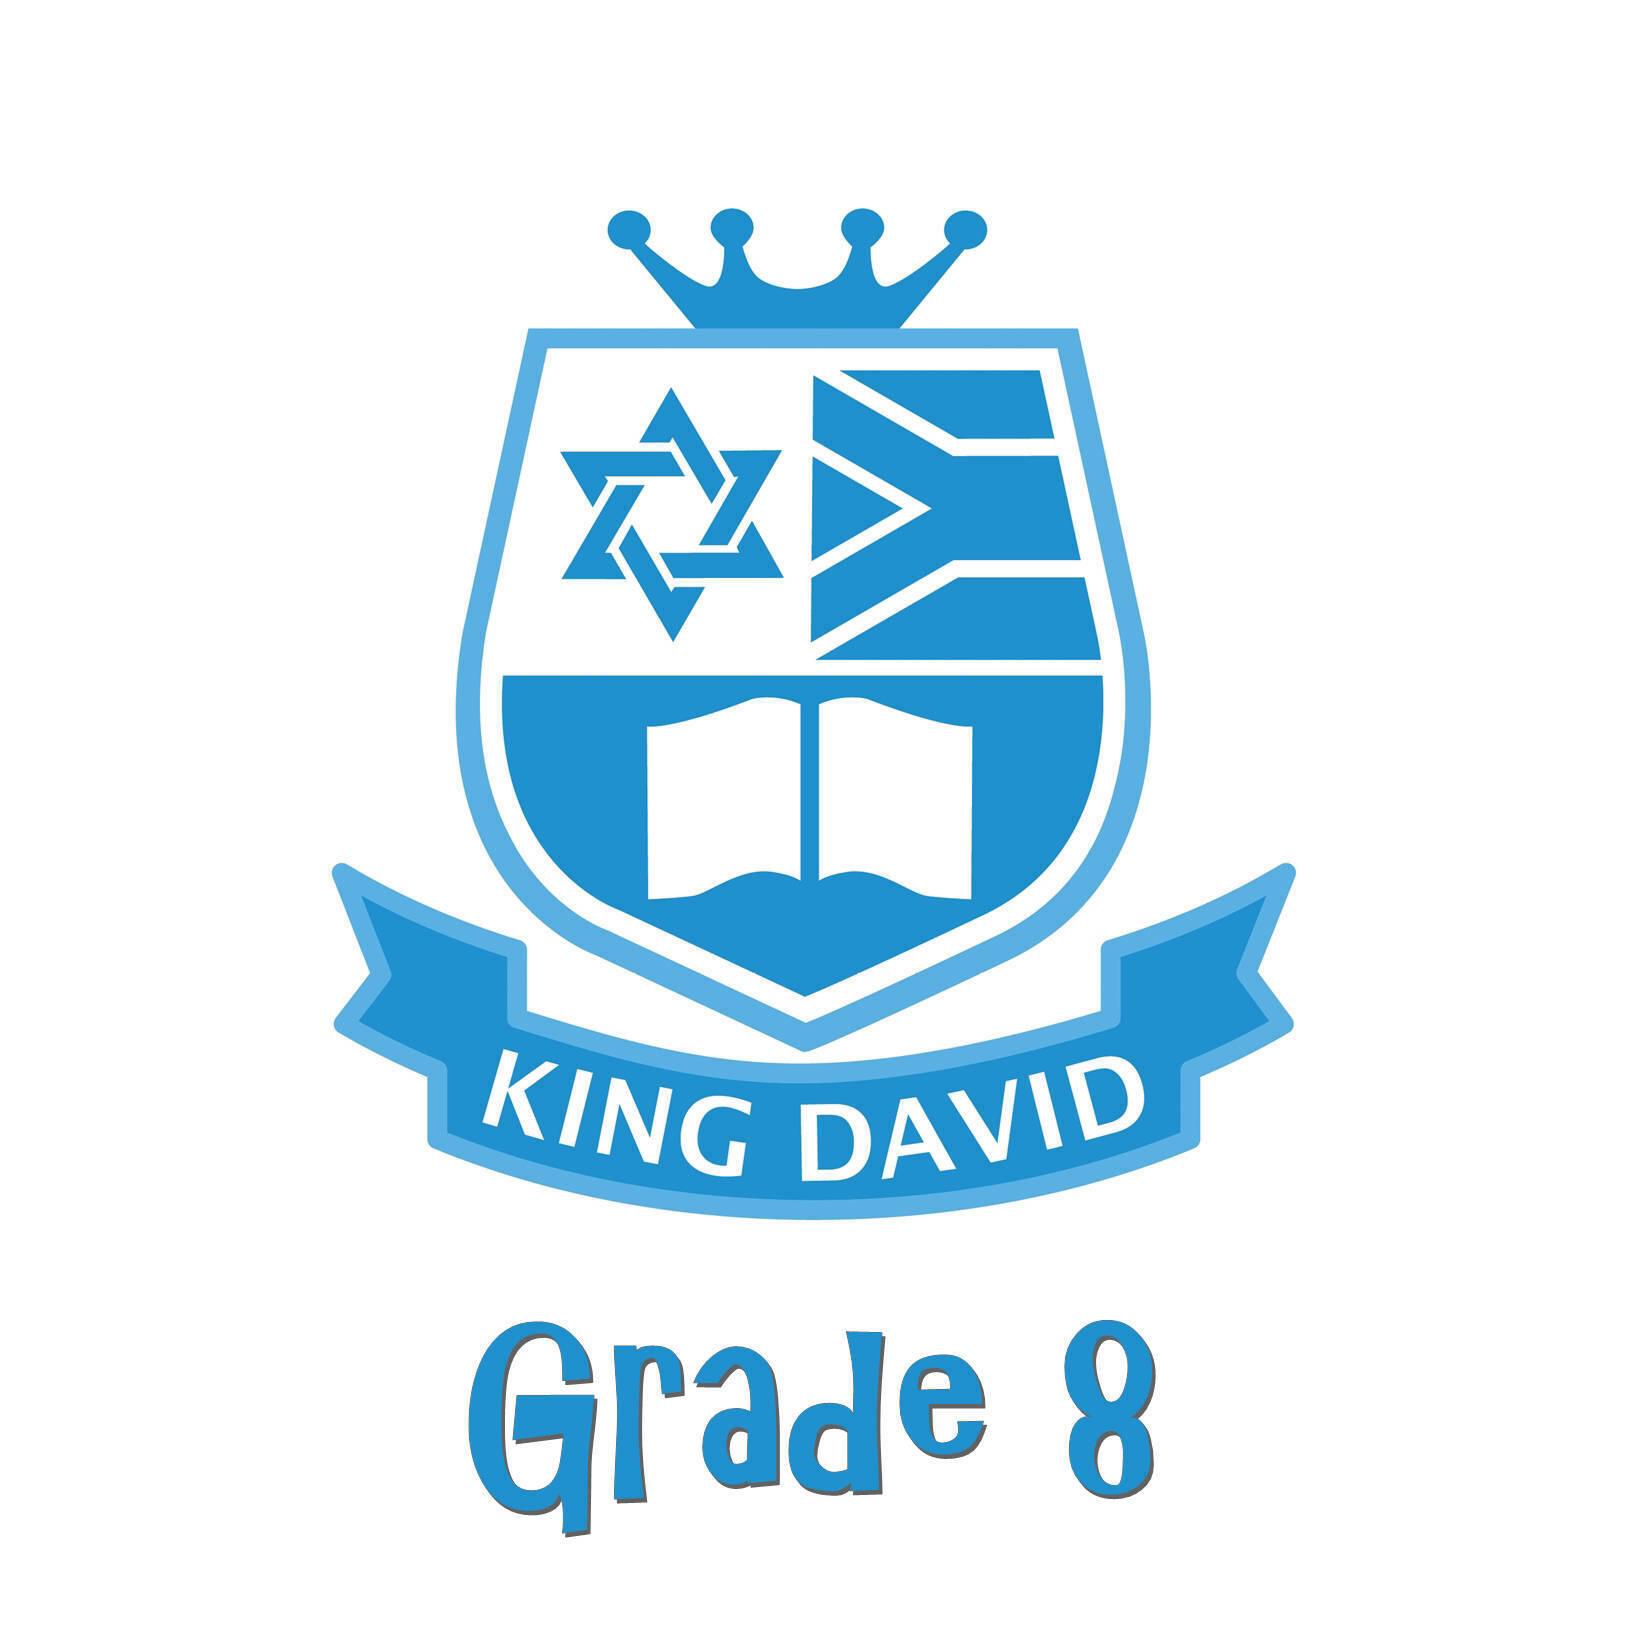 King David Victory Park Grade 8